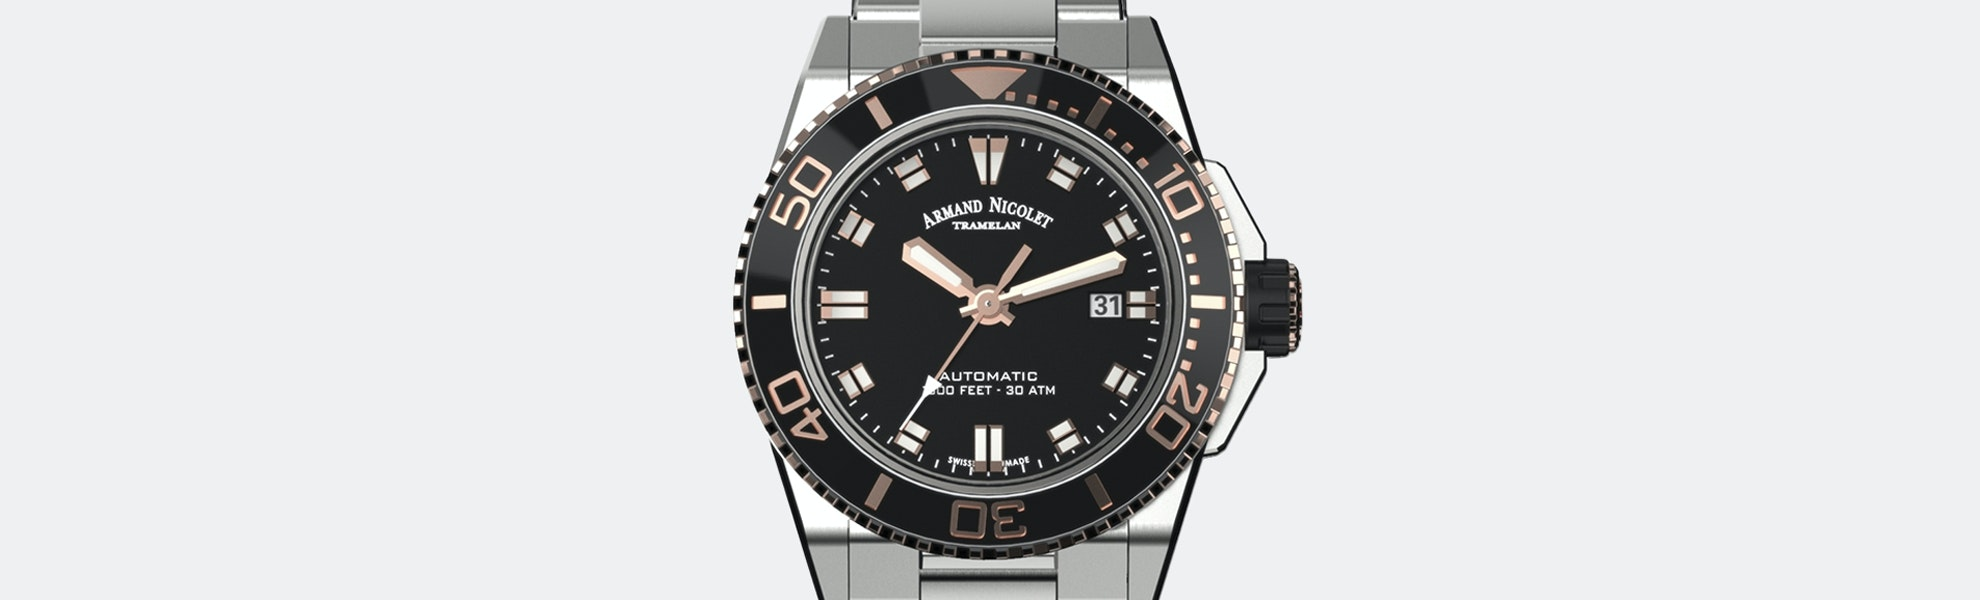 Armand Nicolet JS9 Automatic Watch